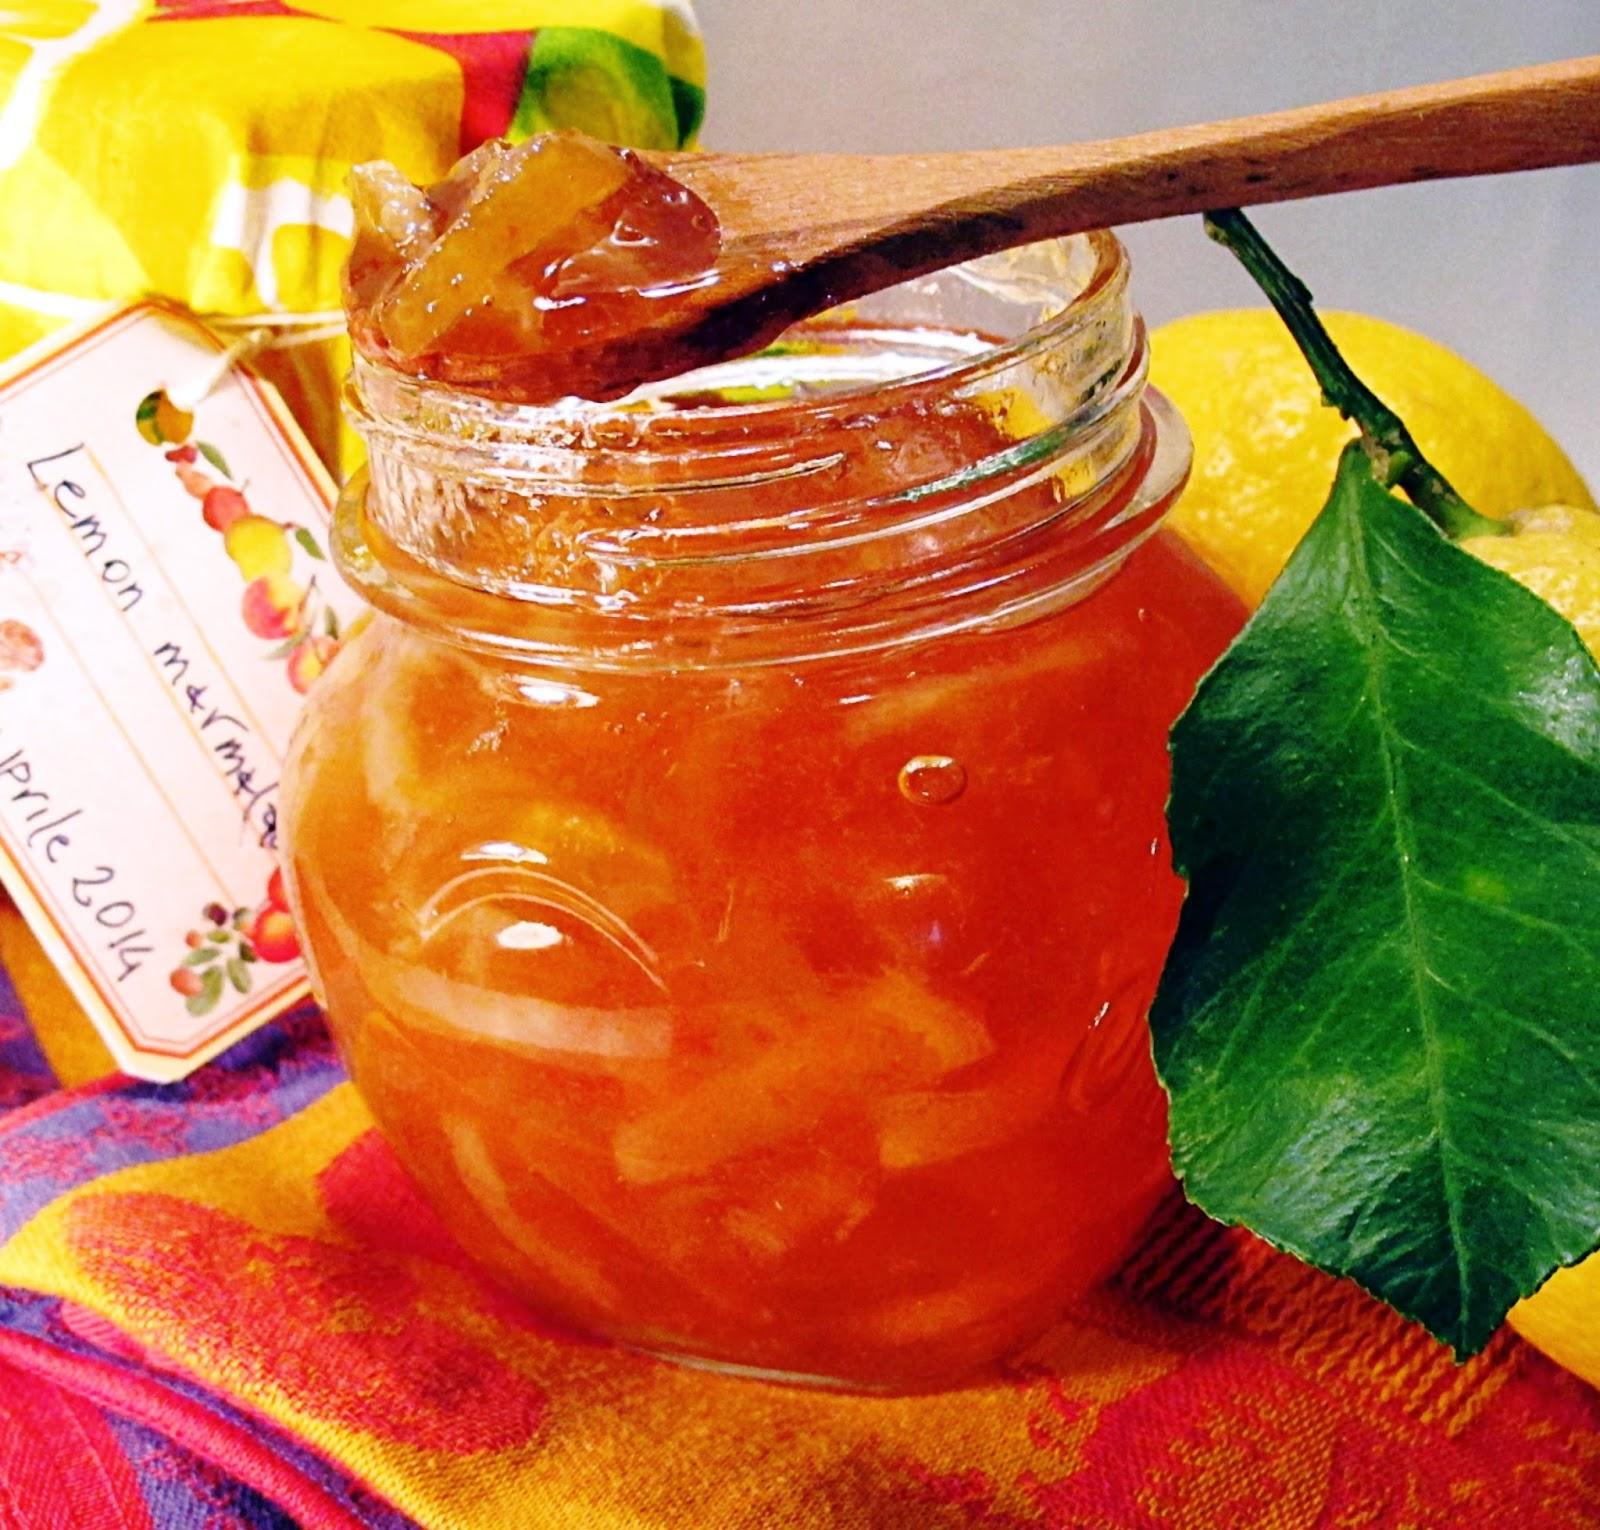 marmellata di limoni metodo inglese, ovvero lemon marmalade